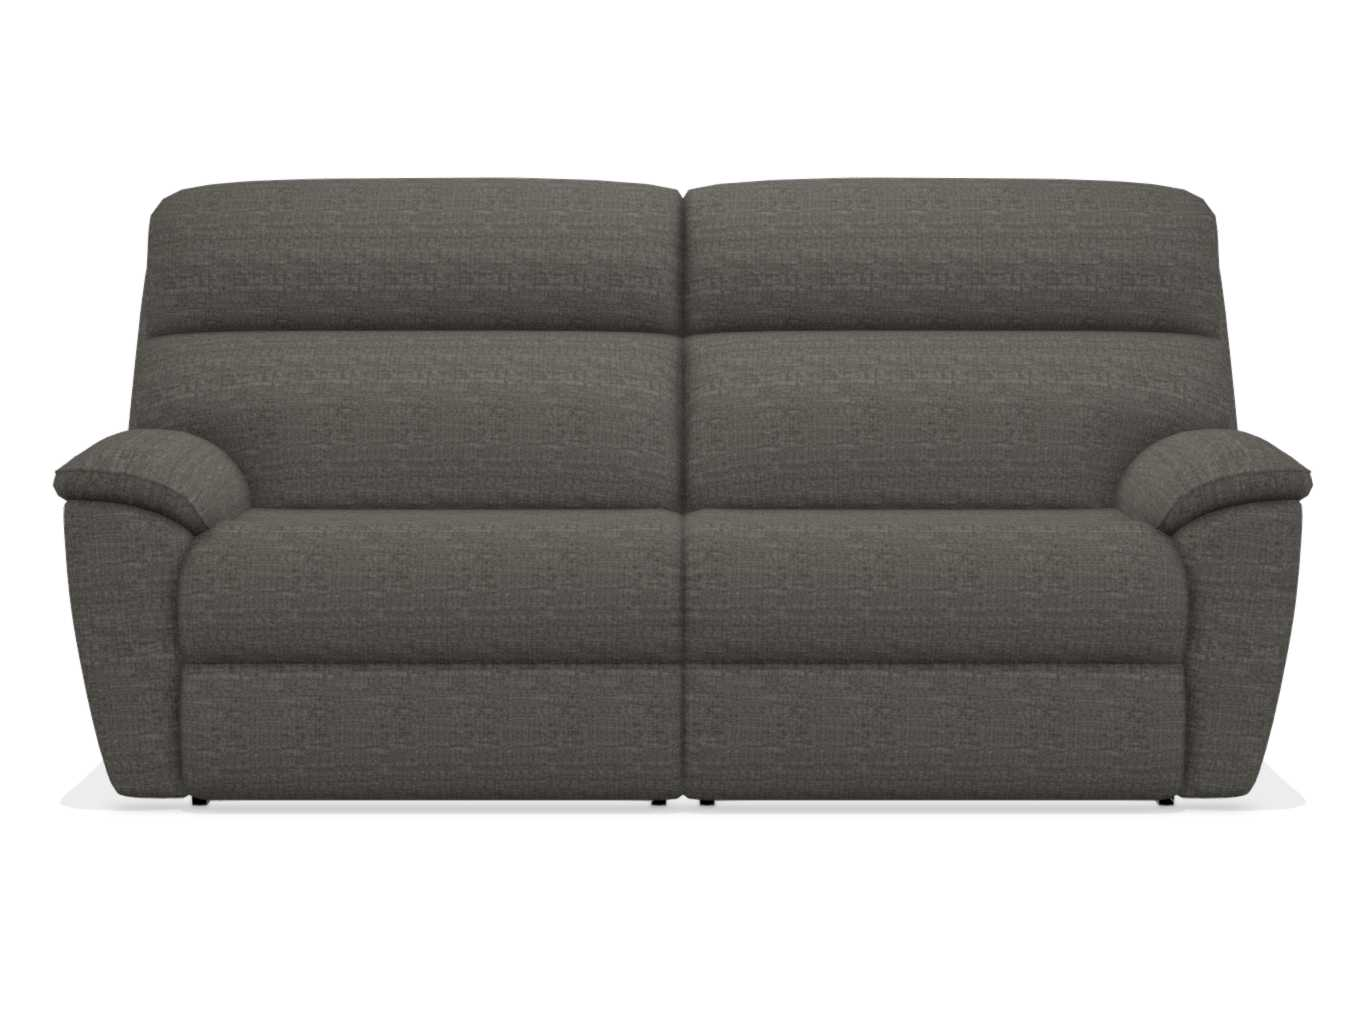 Roman PowerRecline™ with Power Headrest 2-Seat Sofa